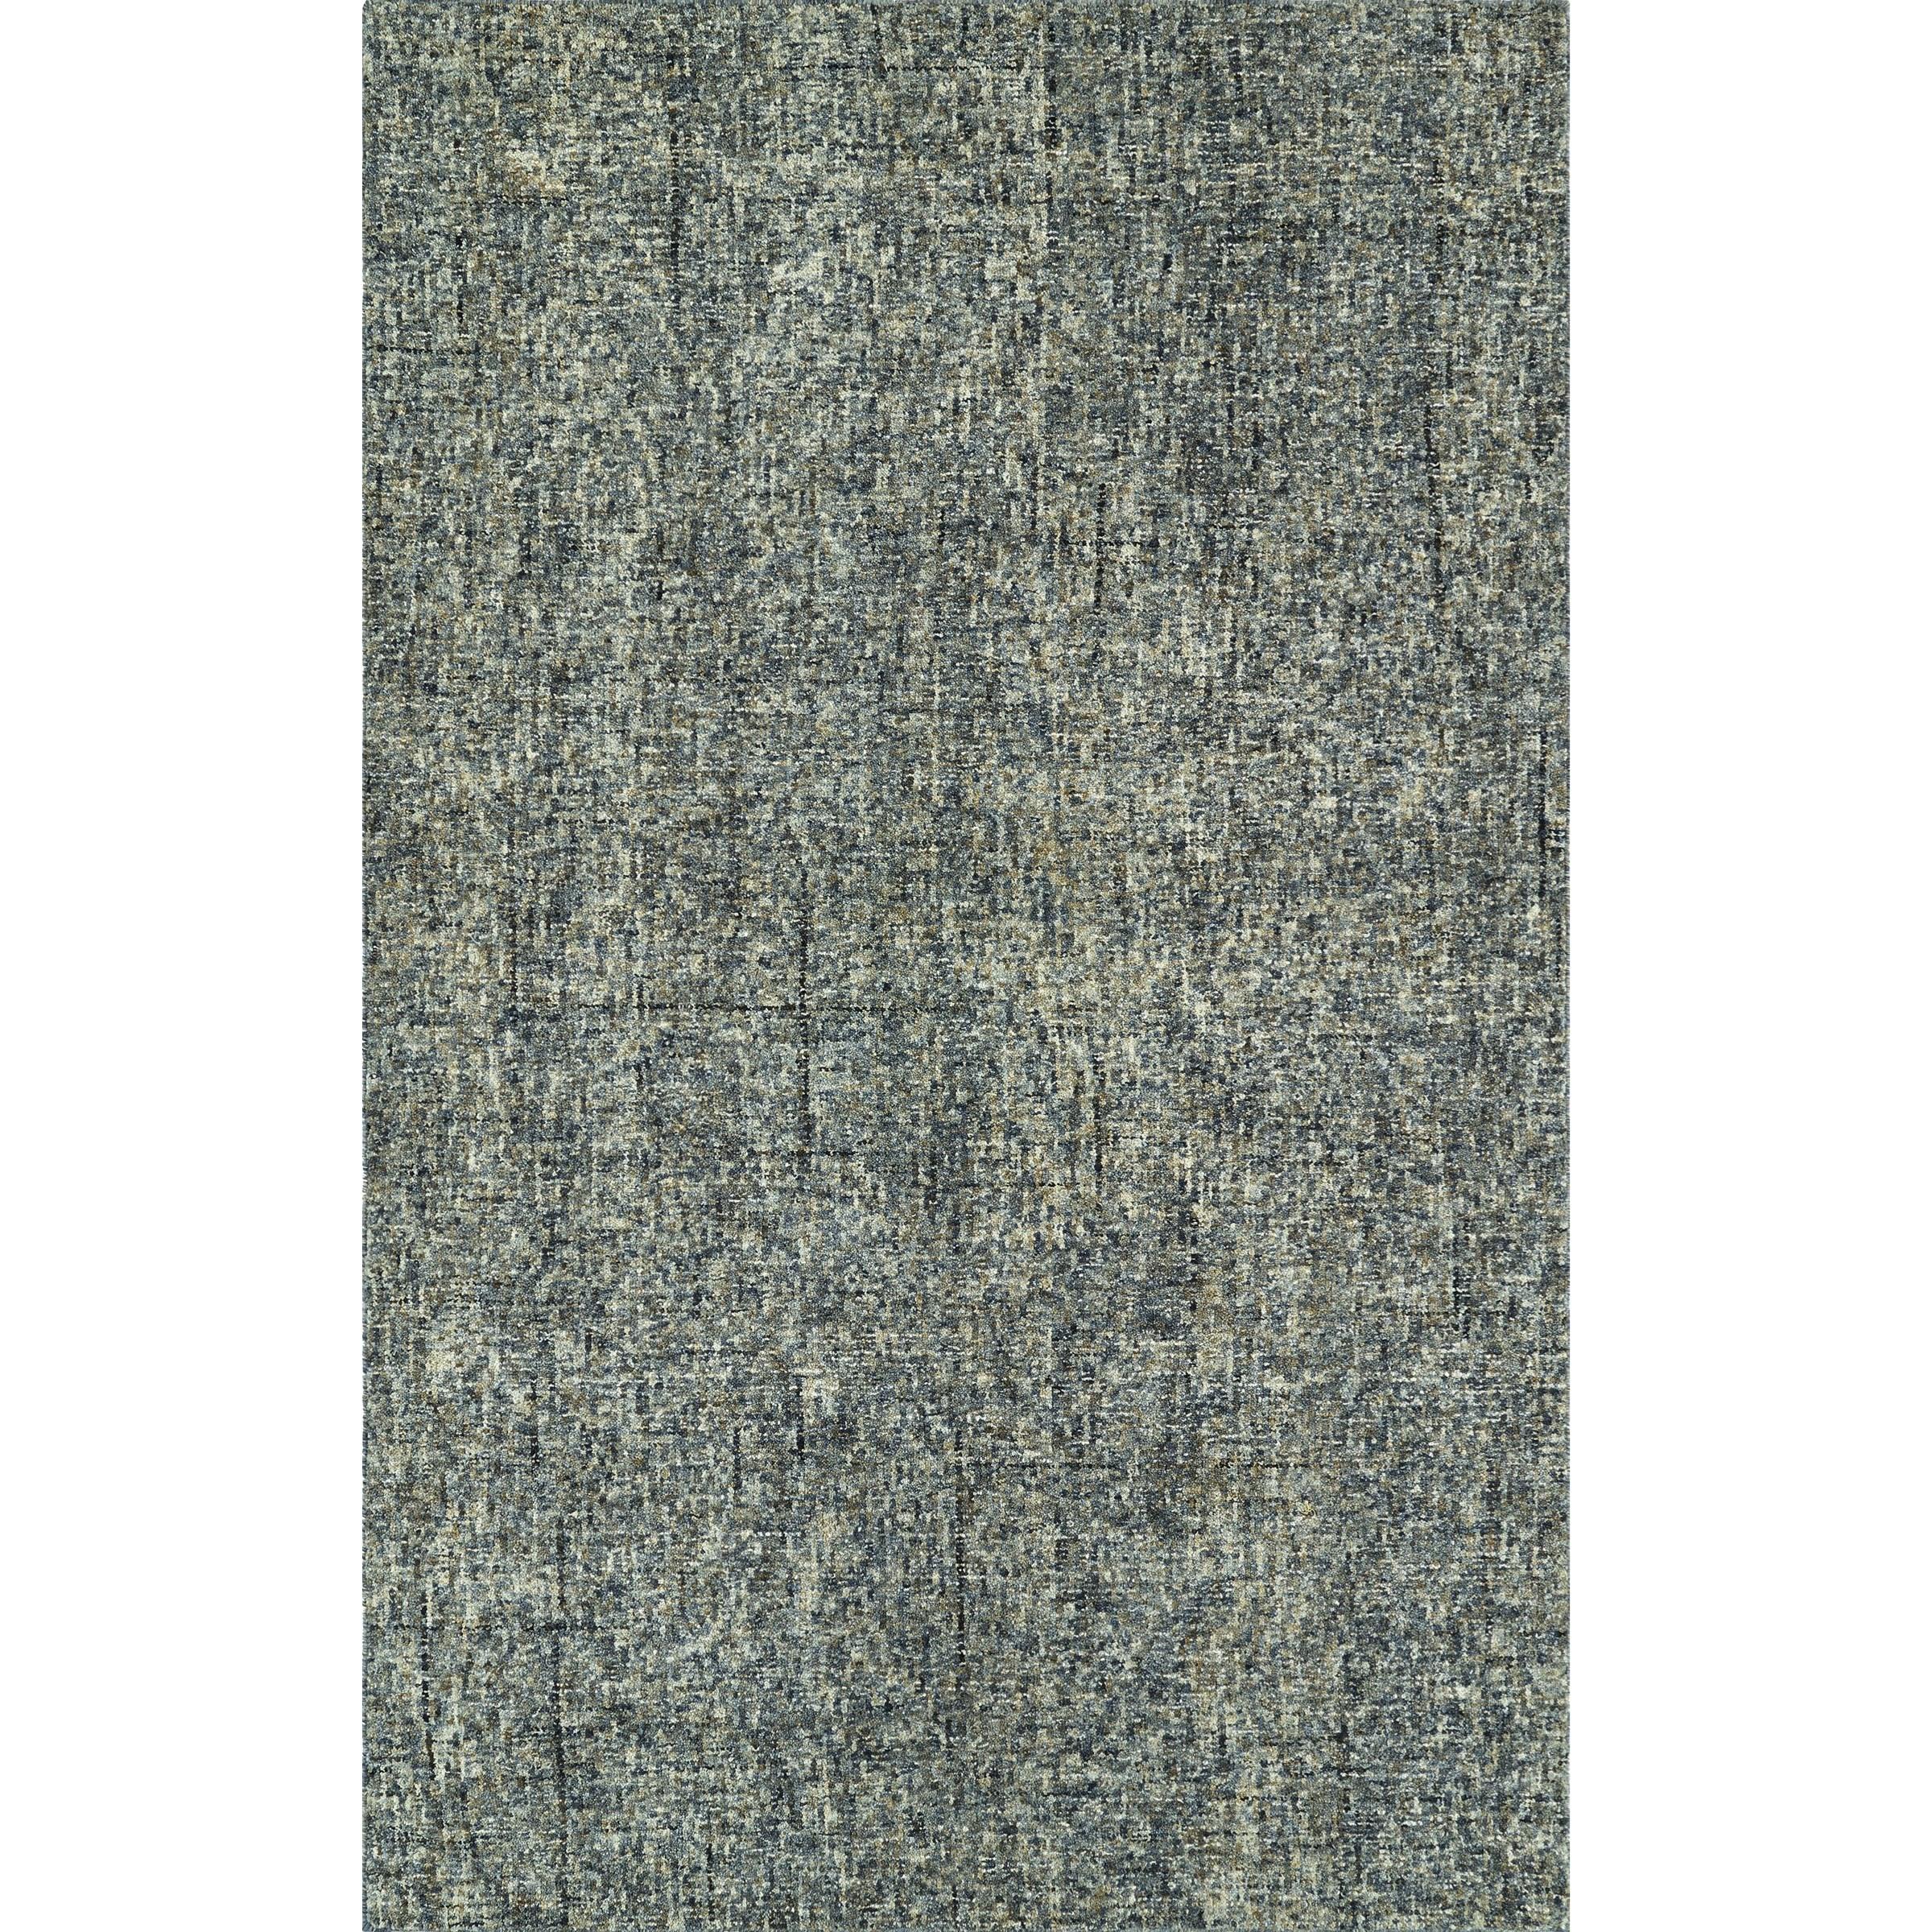 Calisa Lakeview 8'X10' Rug by Dalyn at Sadler's Home Furnishings